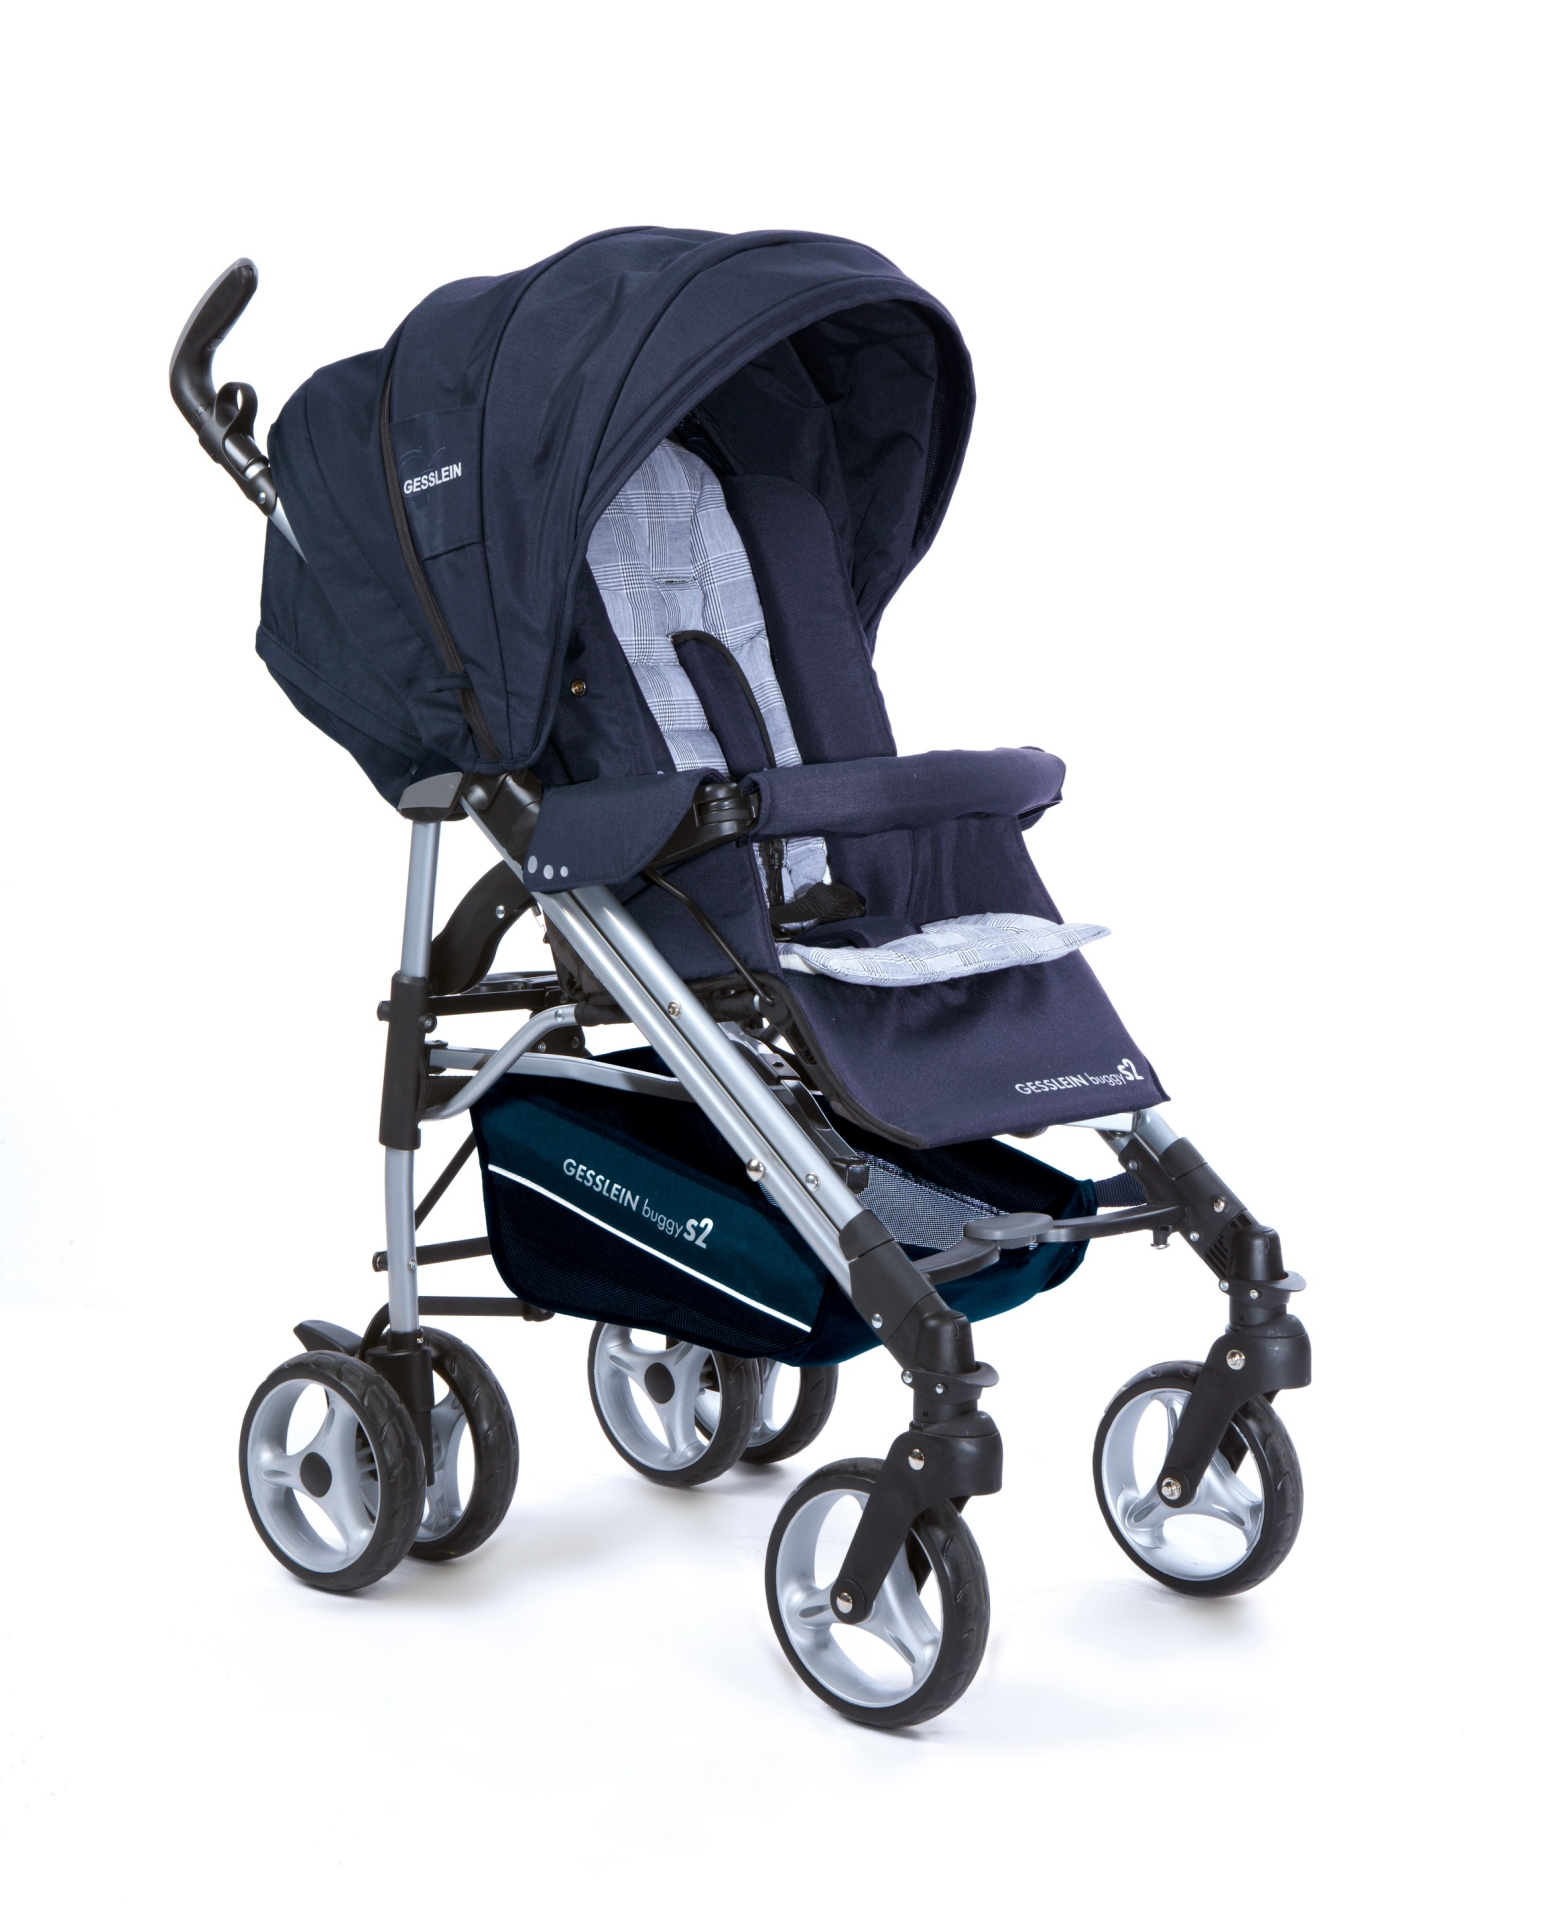 Gesslein Buggy S2 : gesslein buggy s2 2016 174096 buy at kidsroom strollers ~ Orissabook.com Haus und Dekorationen